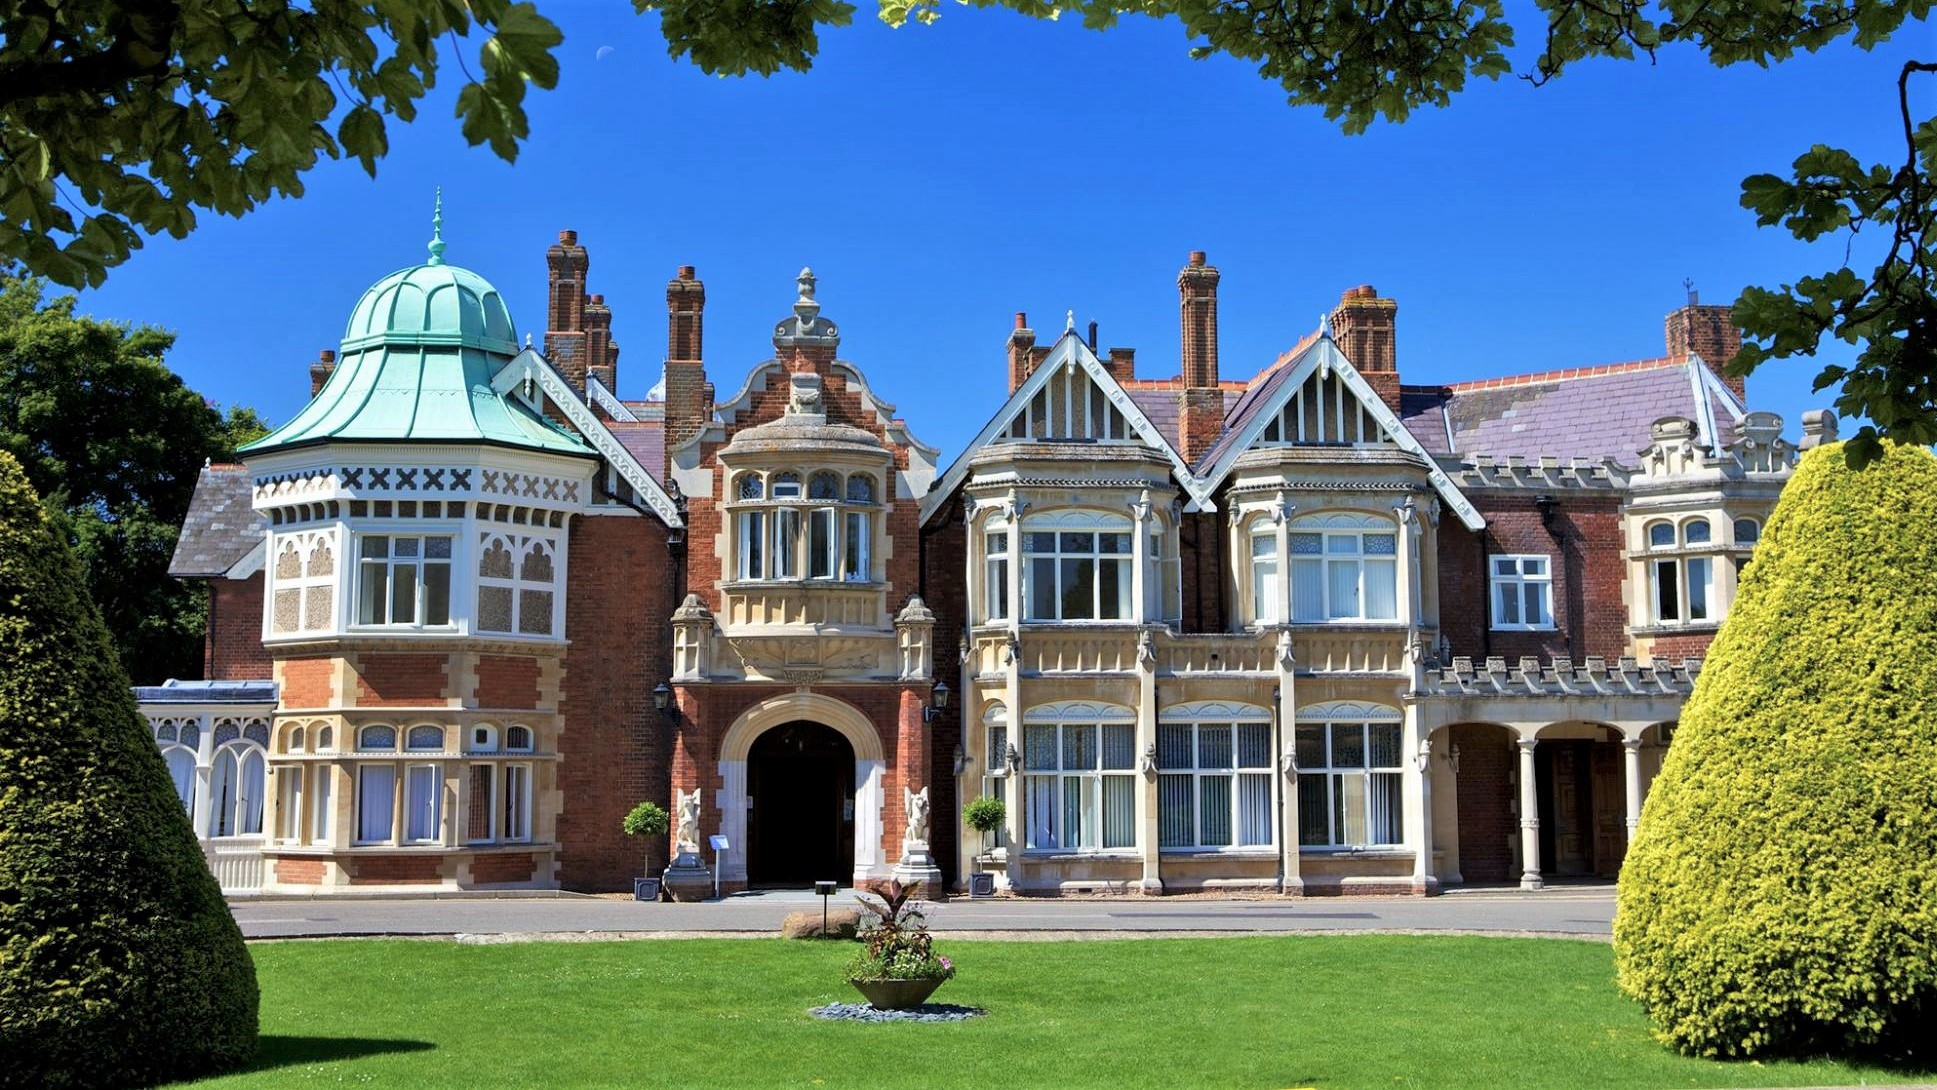 10 Reasons to Visit Milton Keynes